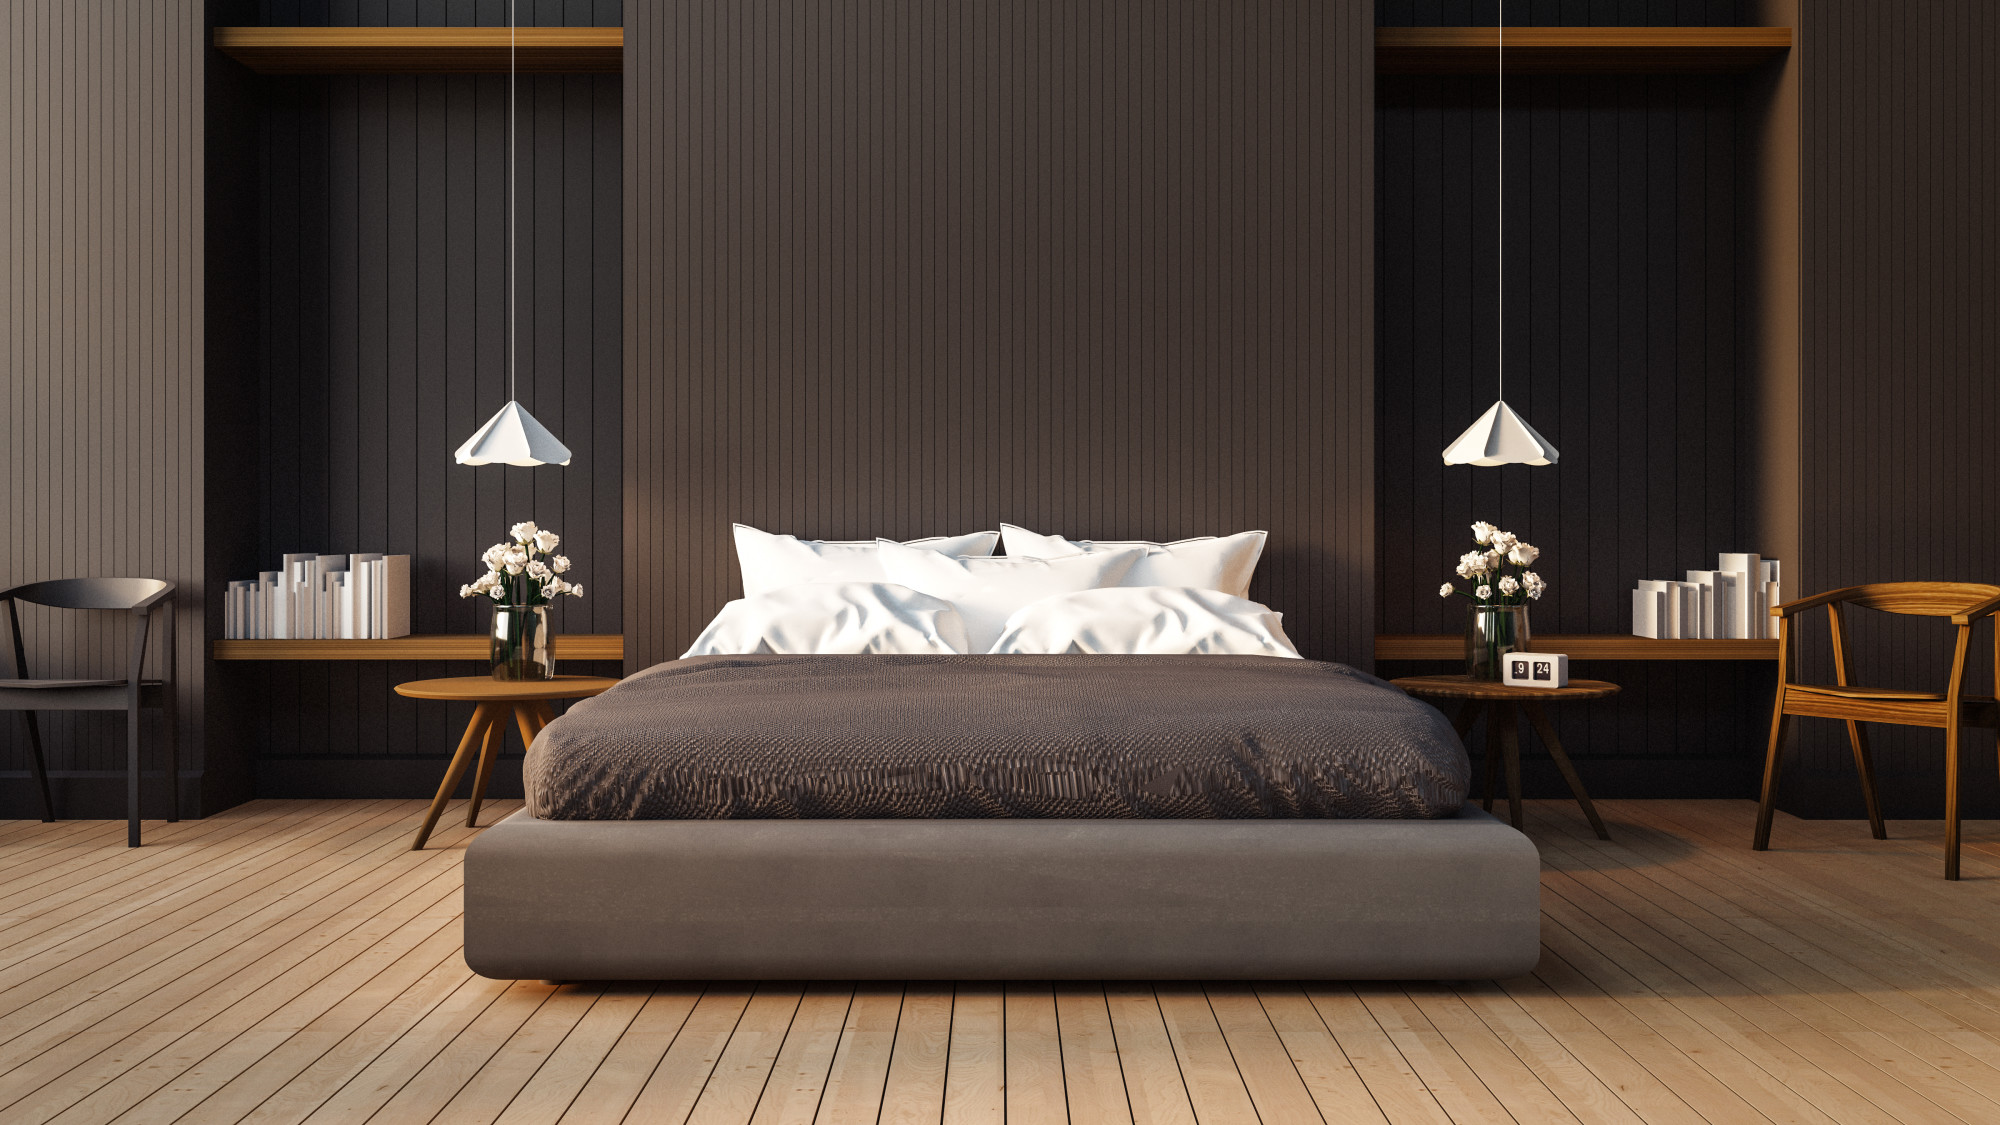 Secret Oasis: How to Make Your Bedroom Feel Like a Luxury Hotel Bedroom